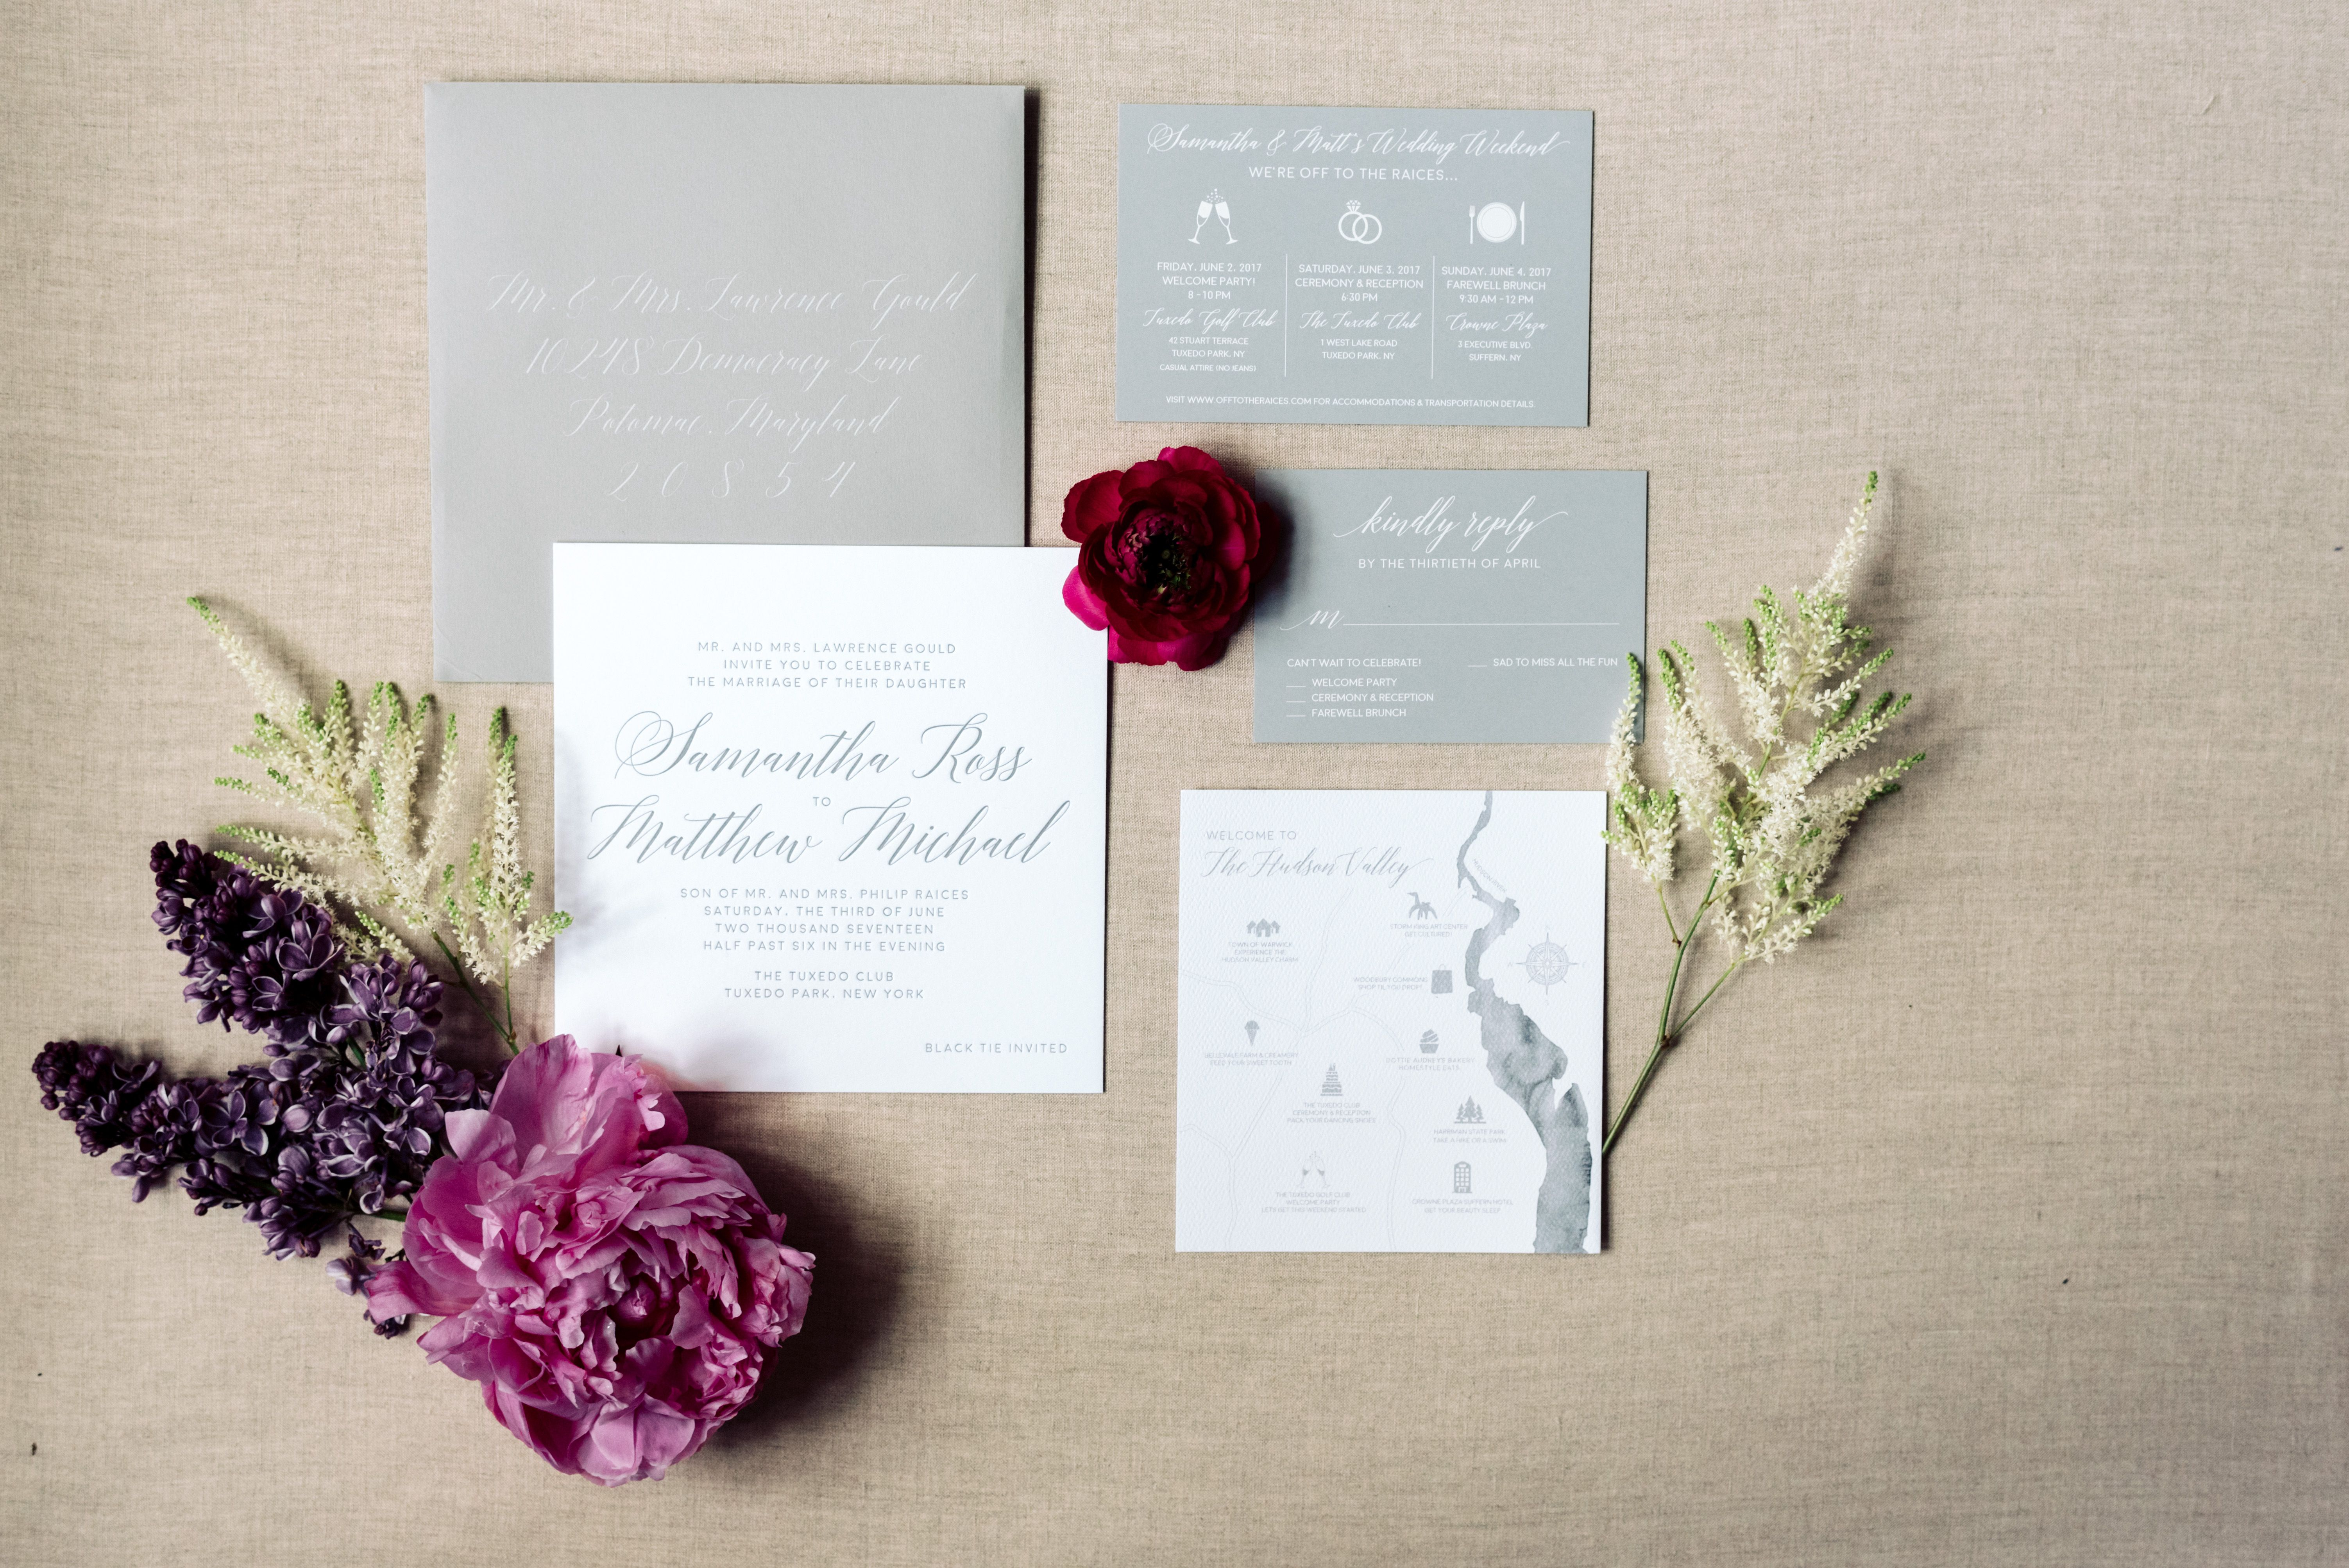 Tuxedo Wedding Invitations - Wedding Invitations